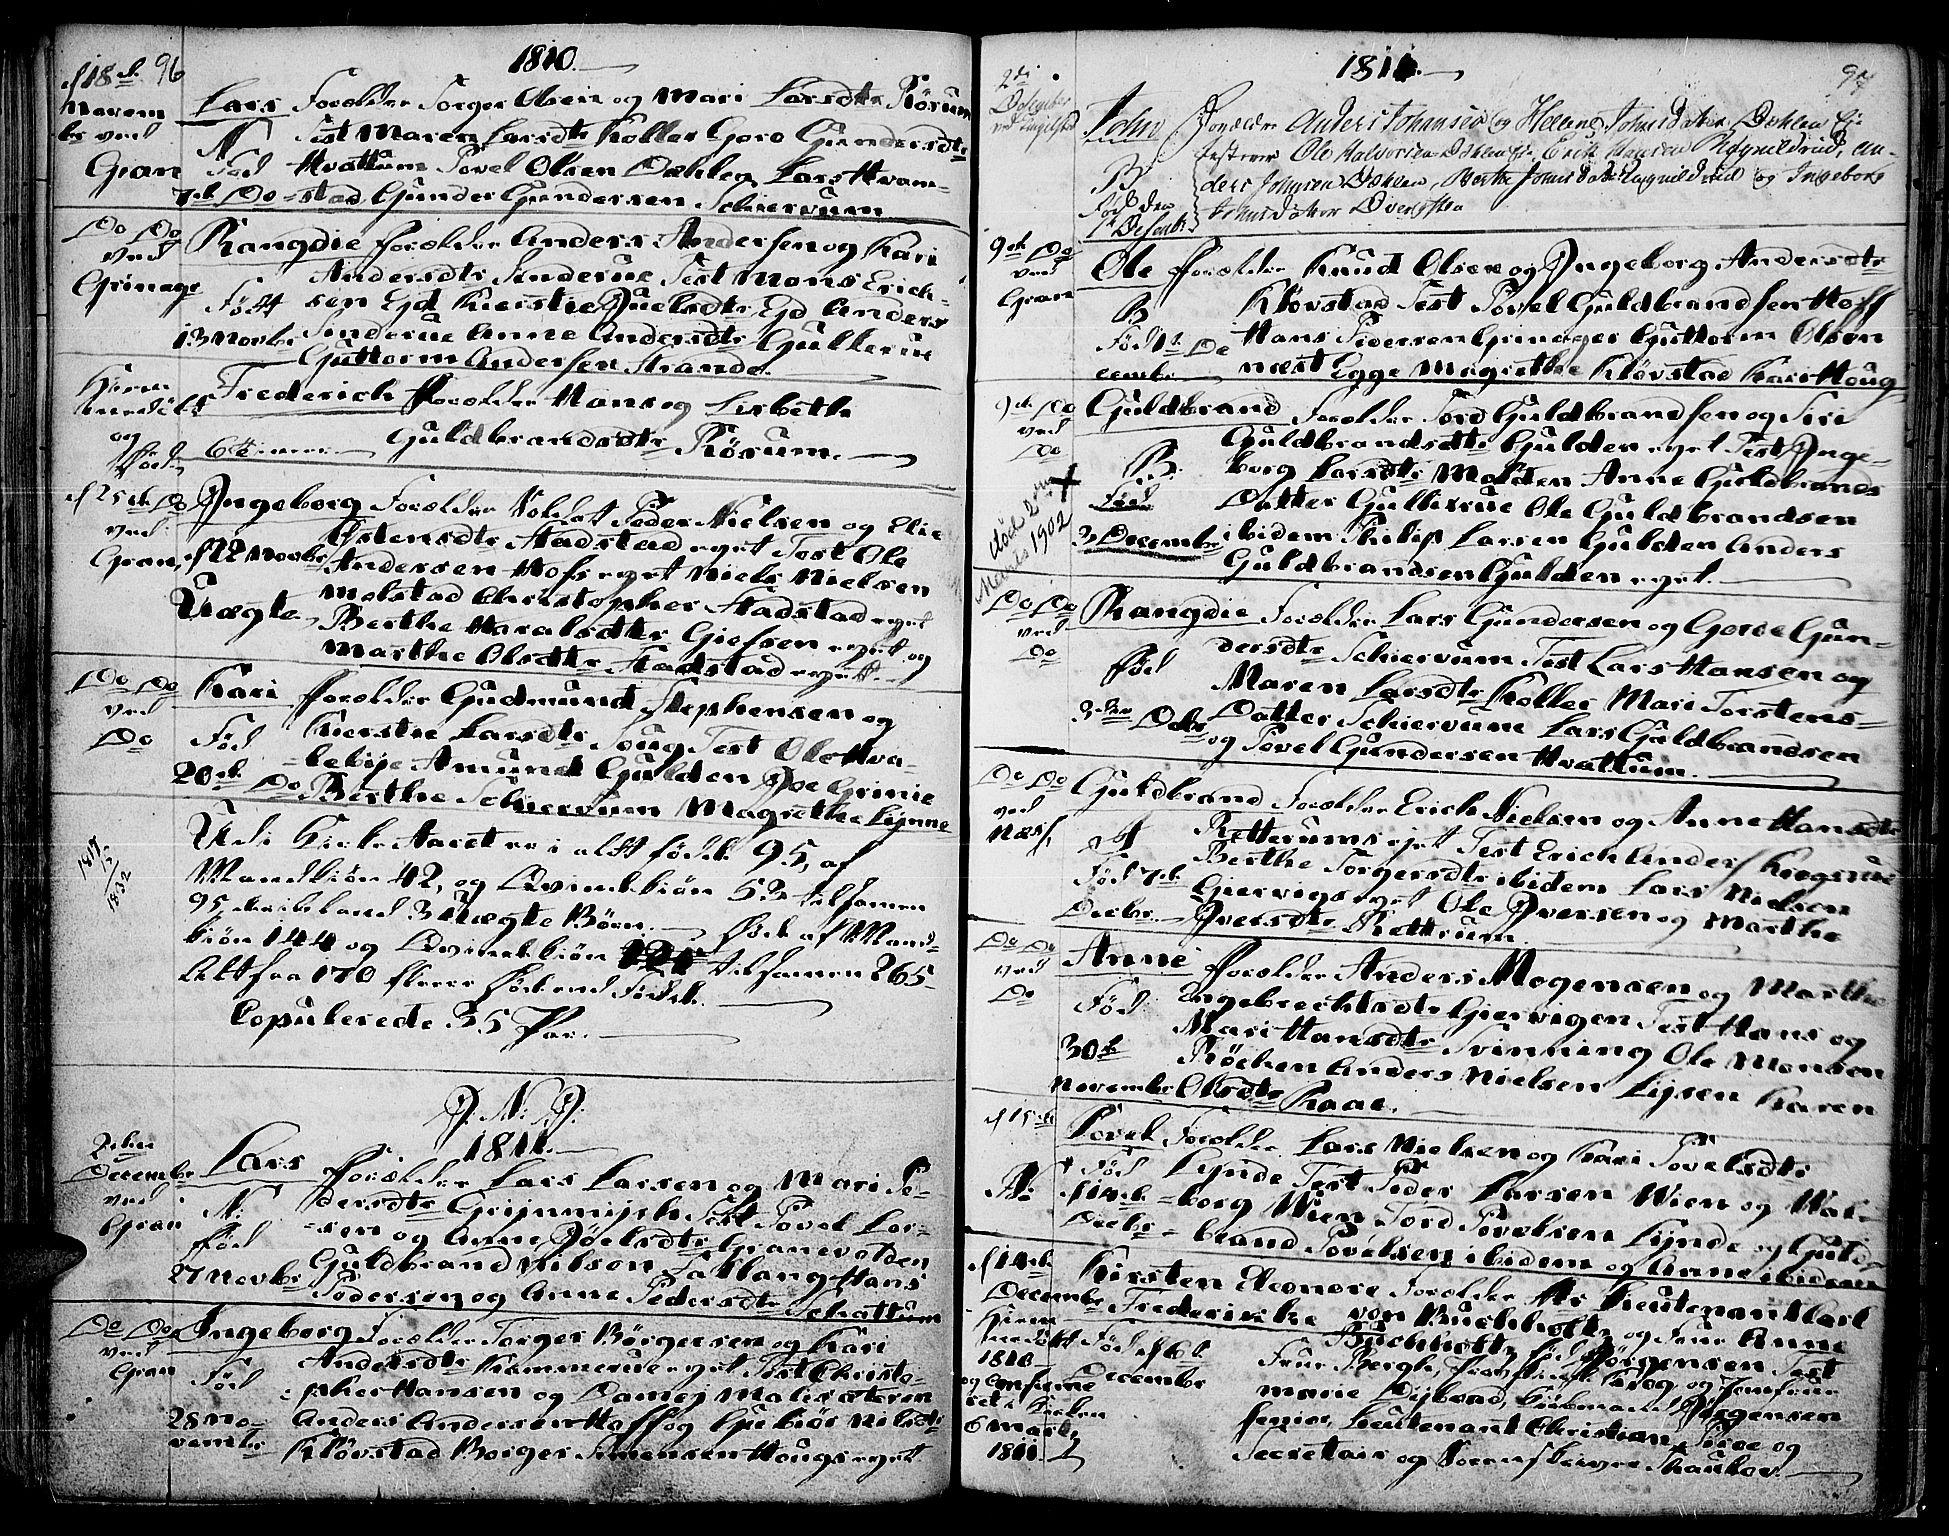 SAH, Gran prestekontor, Ministerialbok nr. 7, 1804-1815, s. 96-97